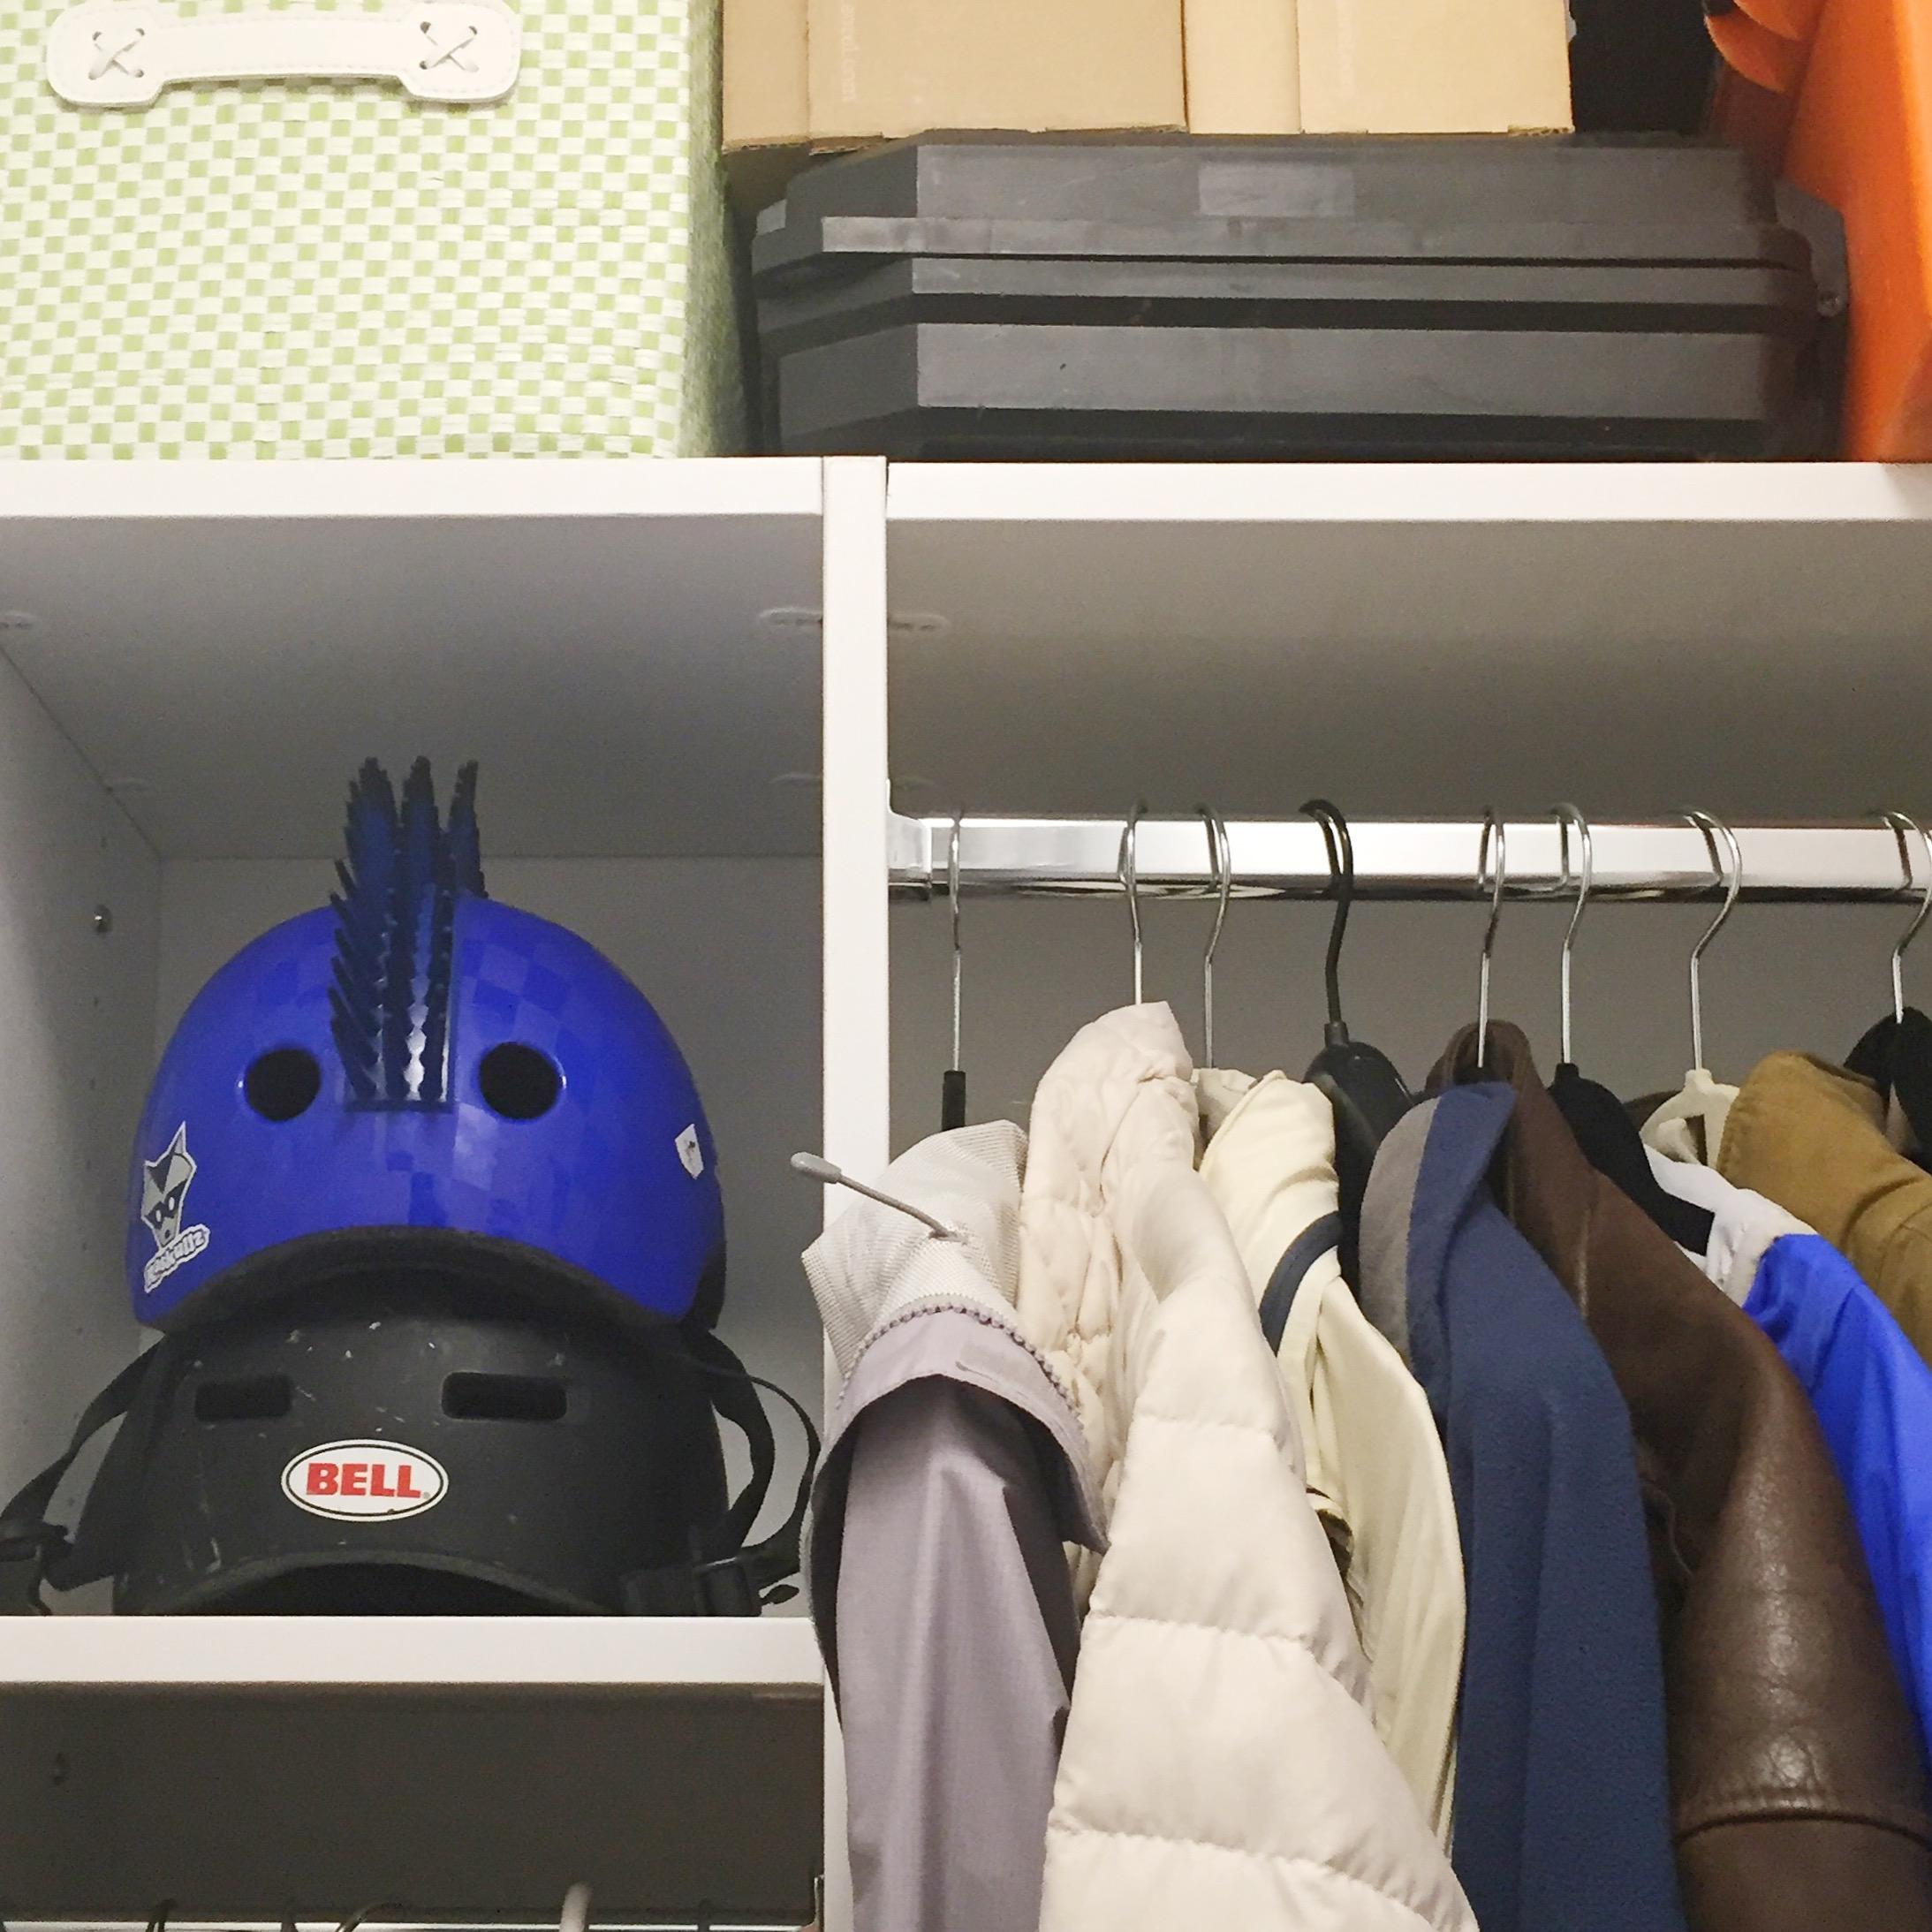 Henry & Higby_Household Closet Organization 2.JPG